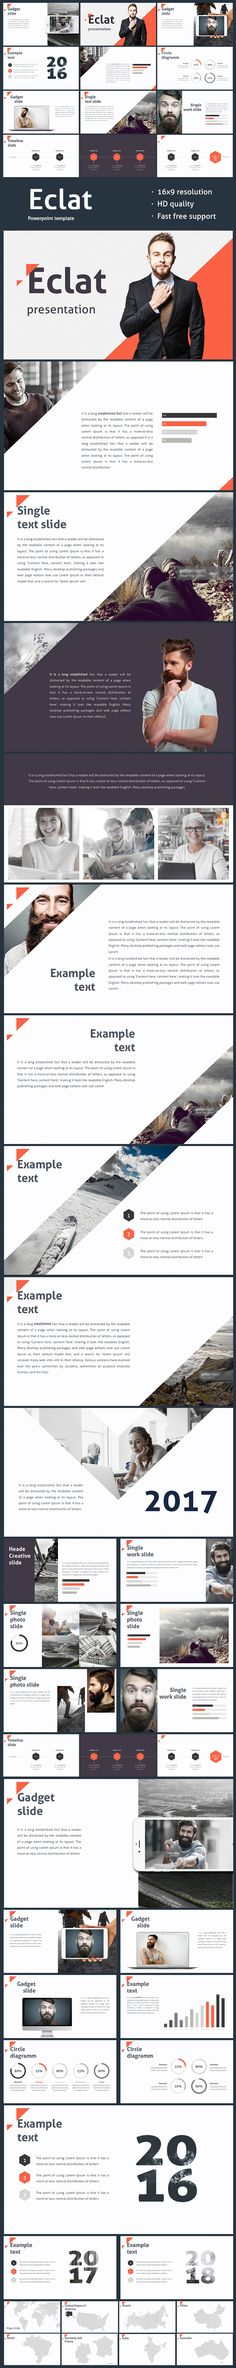 Eclat Powerpoint template - Creative PowerPoint Templates